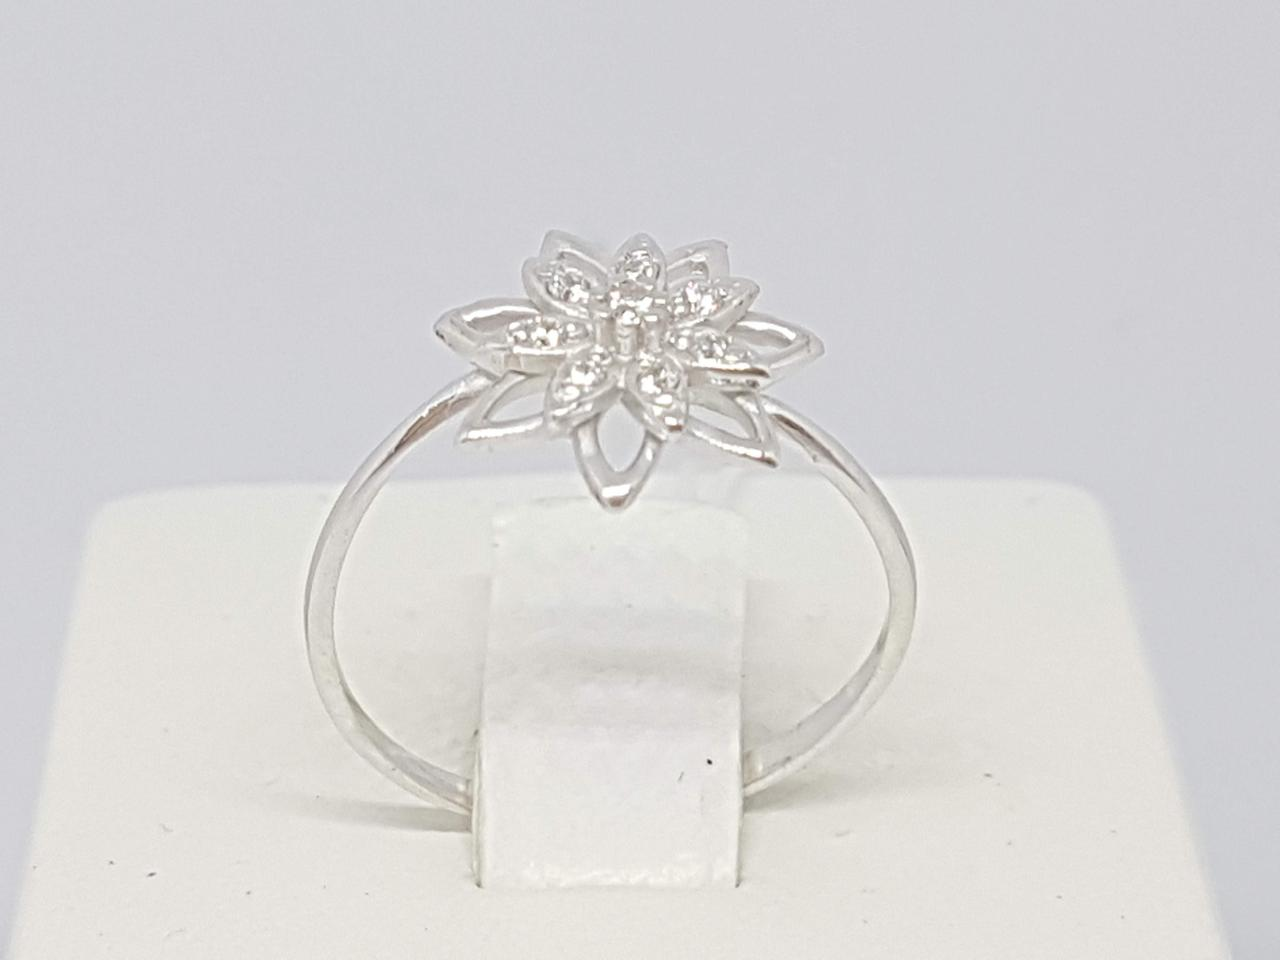 Серебряное кольцо с фианитами. Артикул 10128Р 15,5